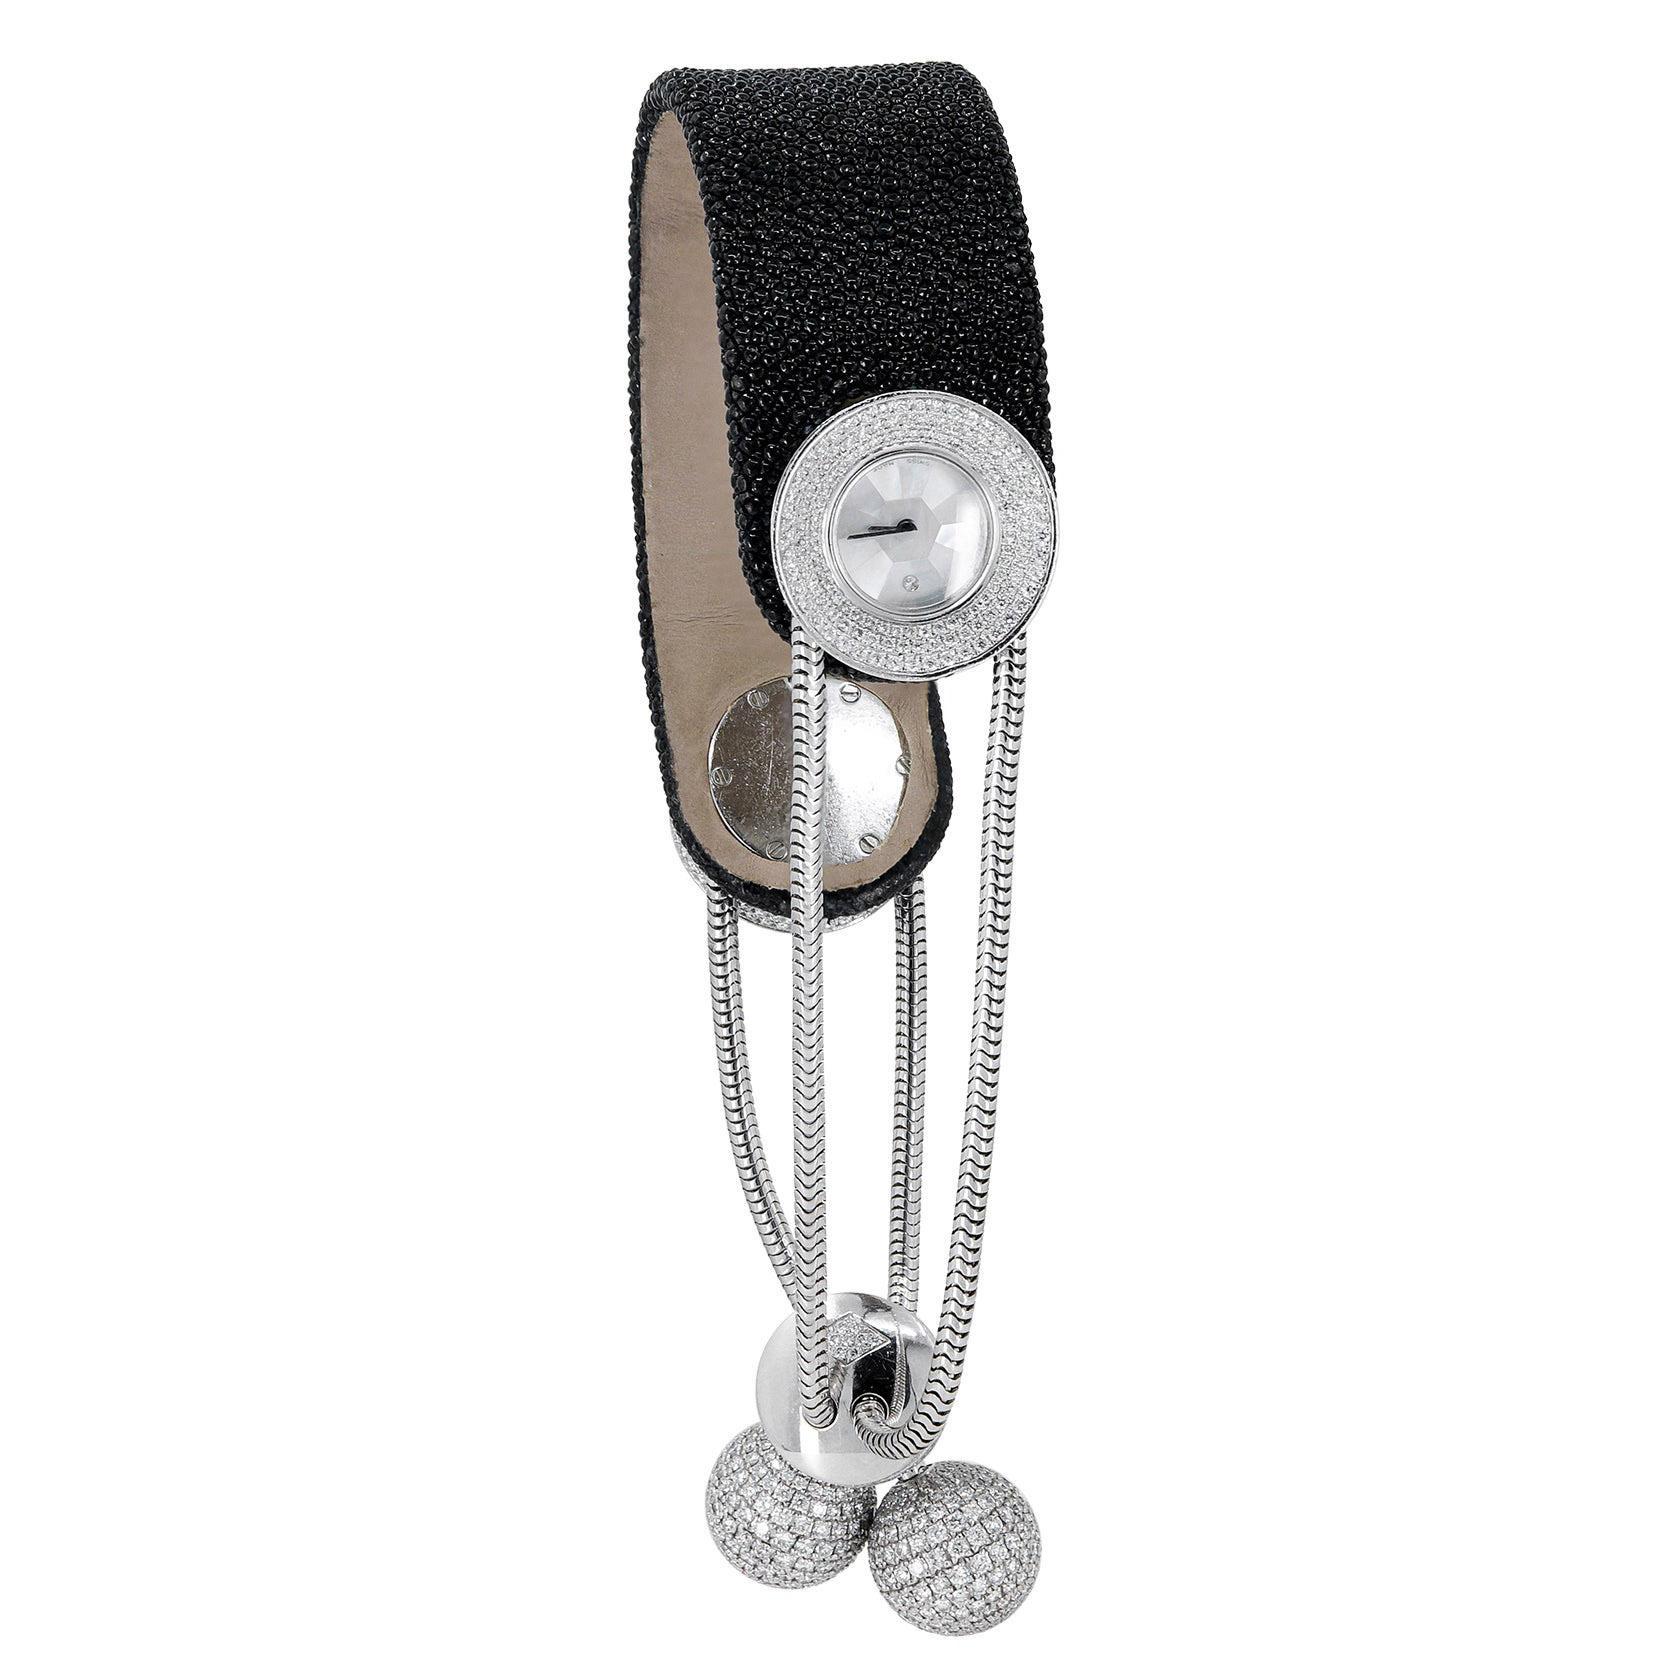 Van Cleef & Arpels Diamond Mother of Pearl Ludo Pampilles Quartz Wristwatch